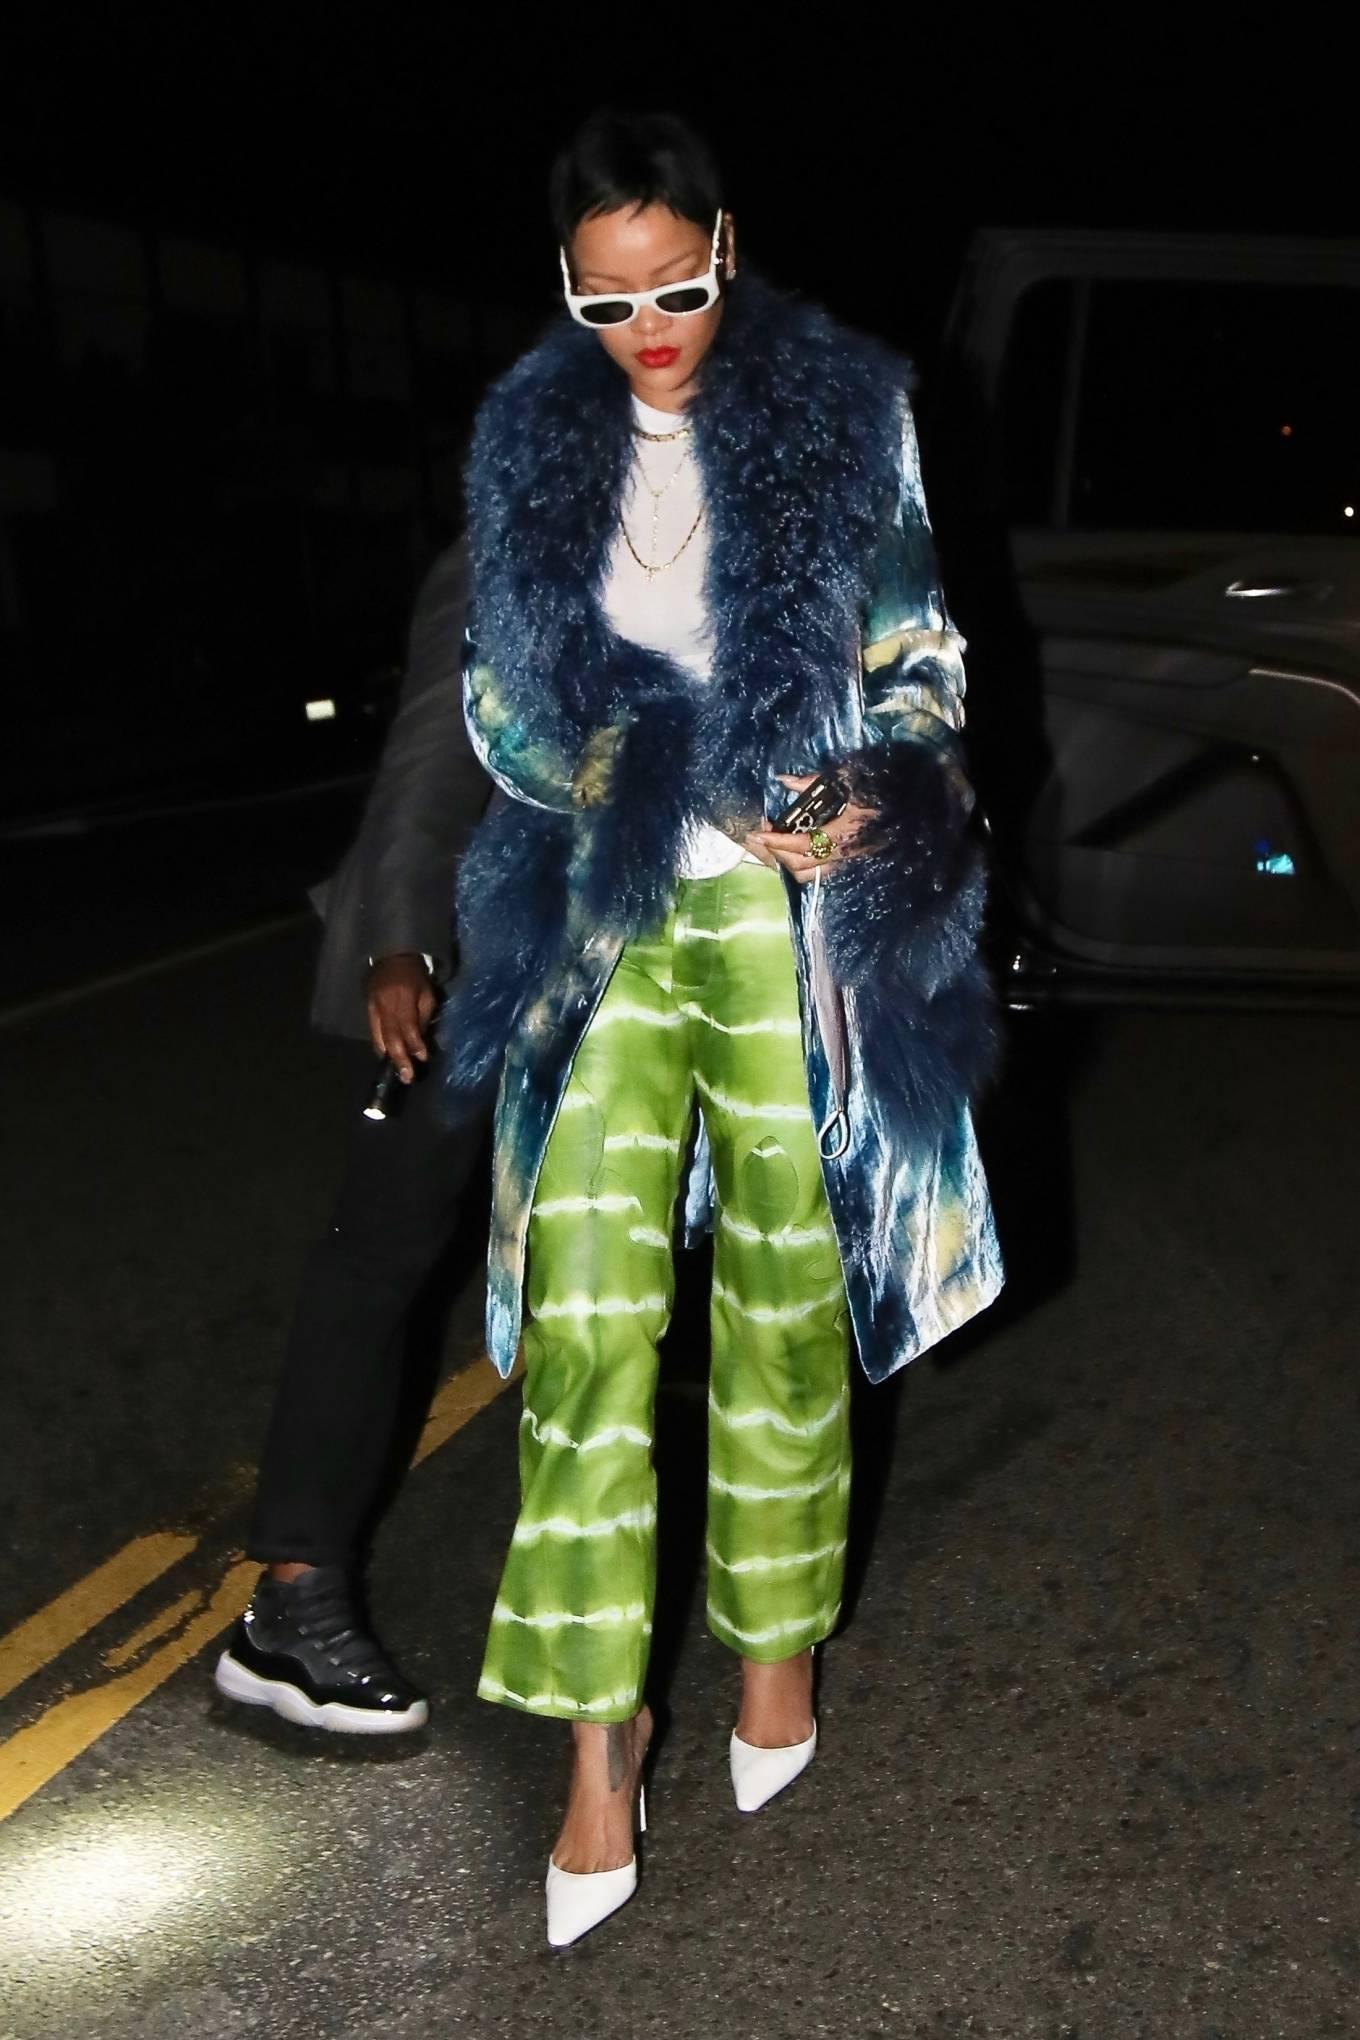 Rihanna - With new short hair style at Giorgio Baldi in Santa Monica